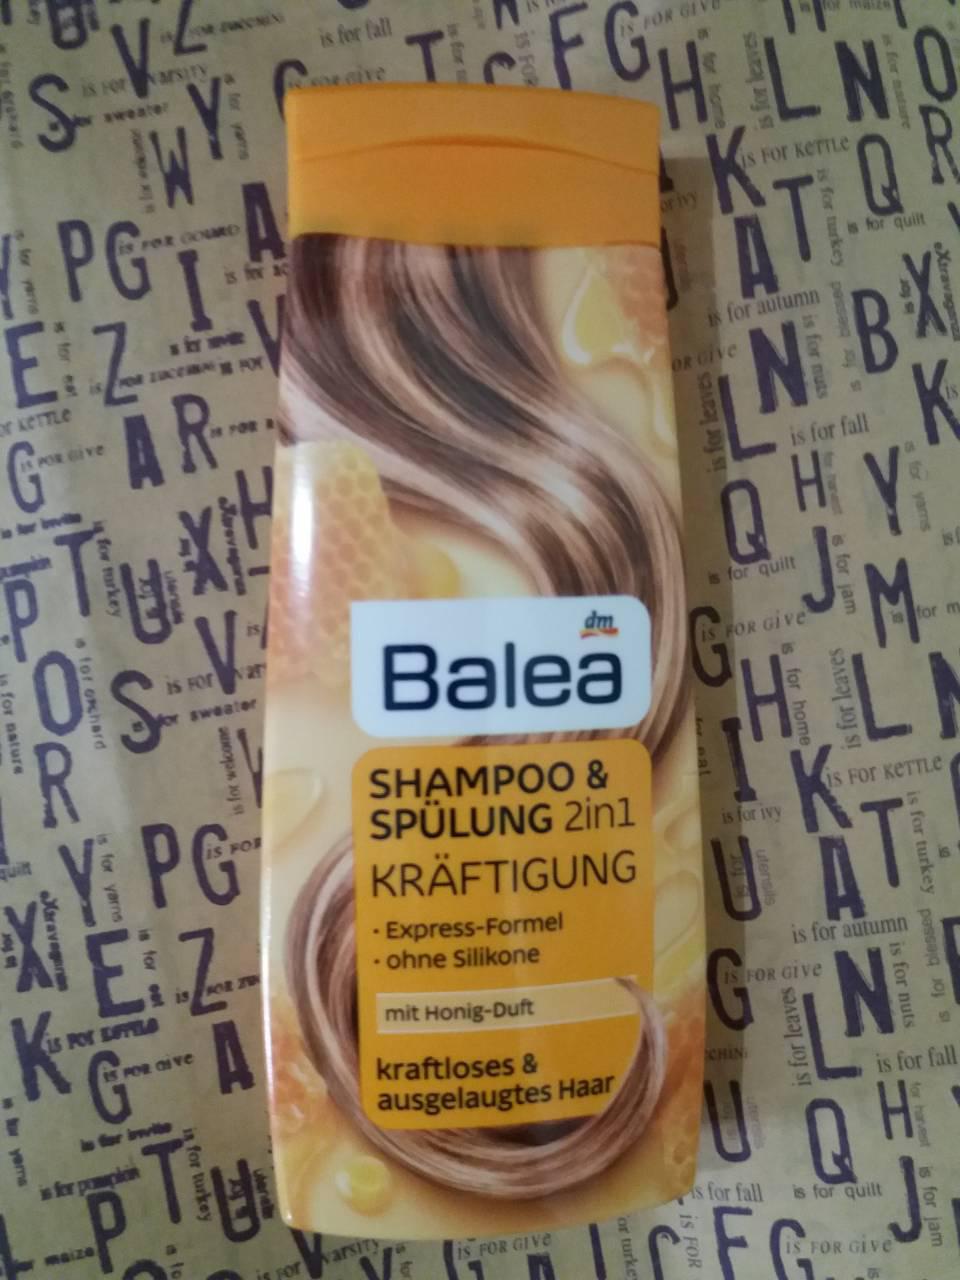 Шампунь Balea 2in1 Kräftigung Shampoo + Spülung